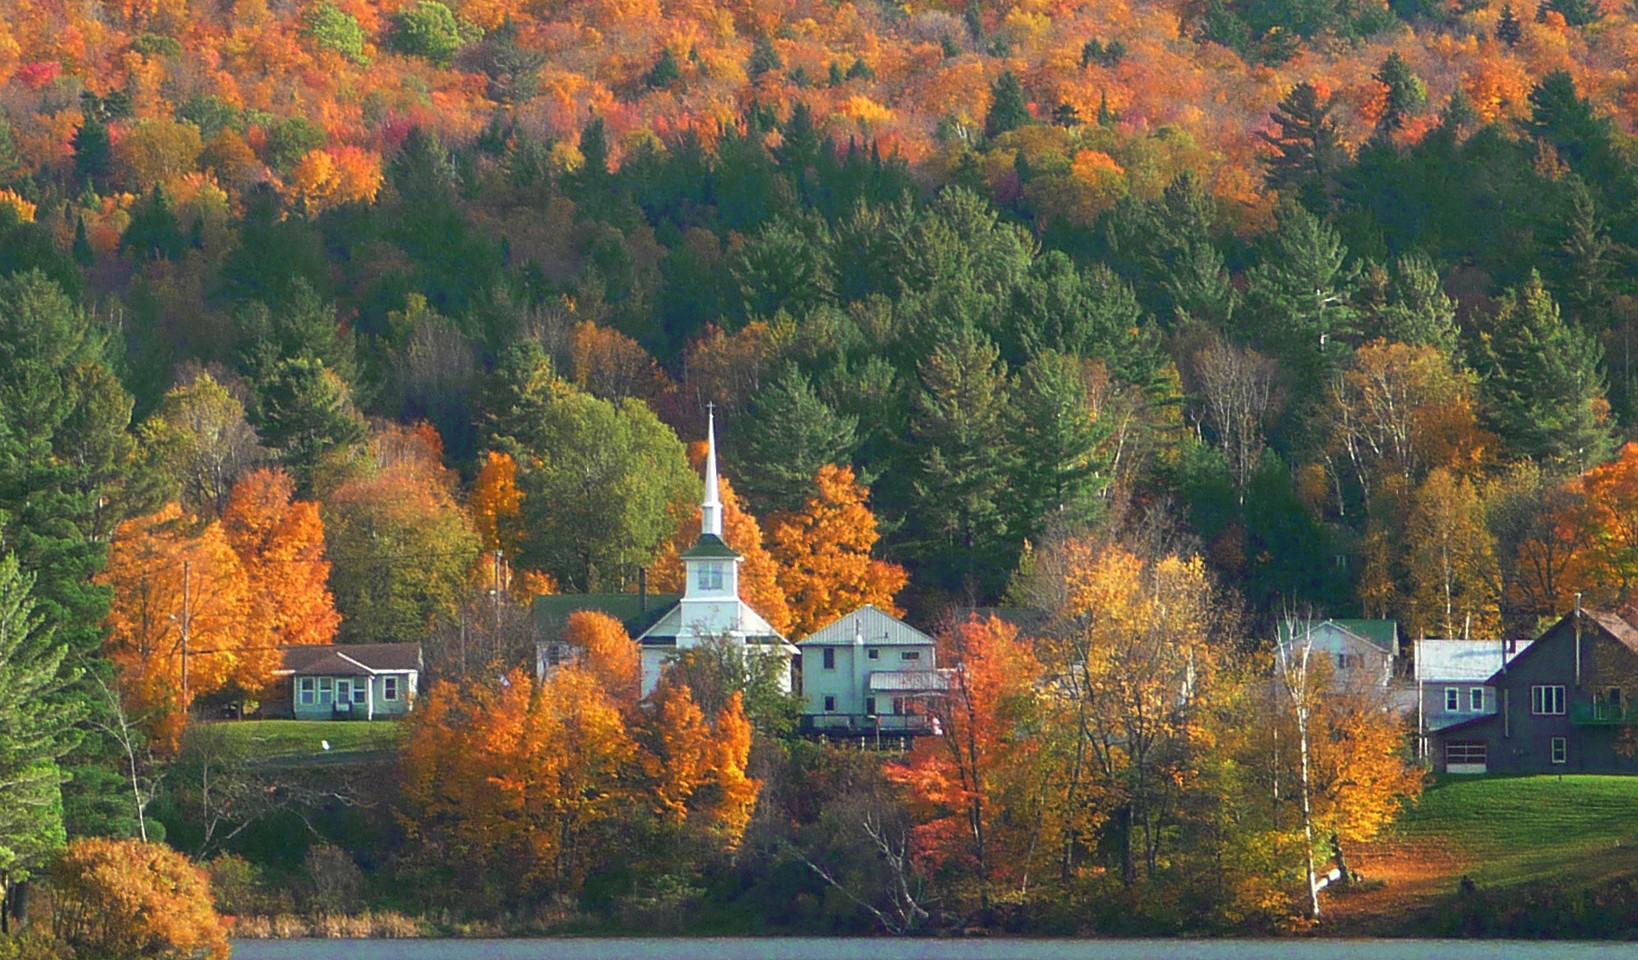 A Picturesque Adirondak Village